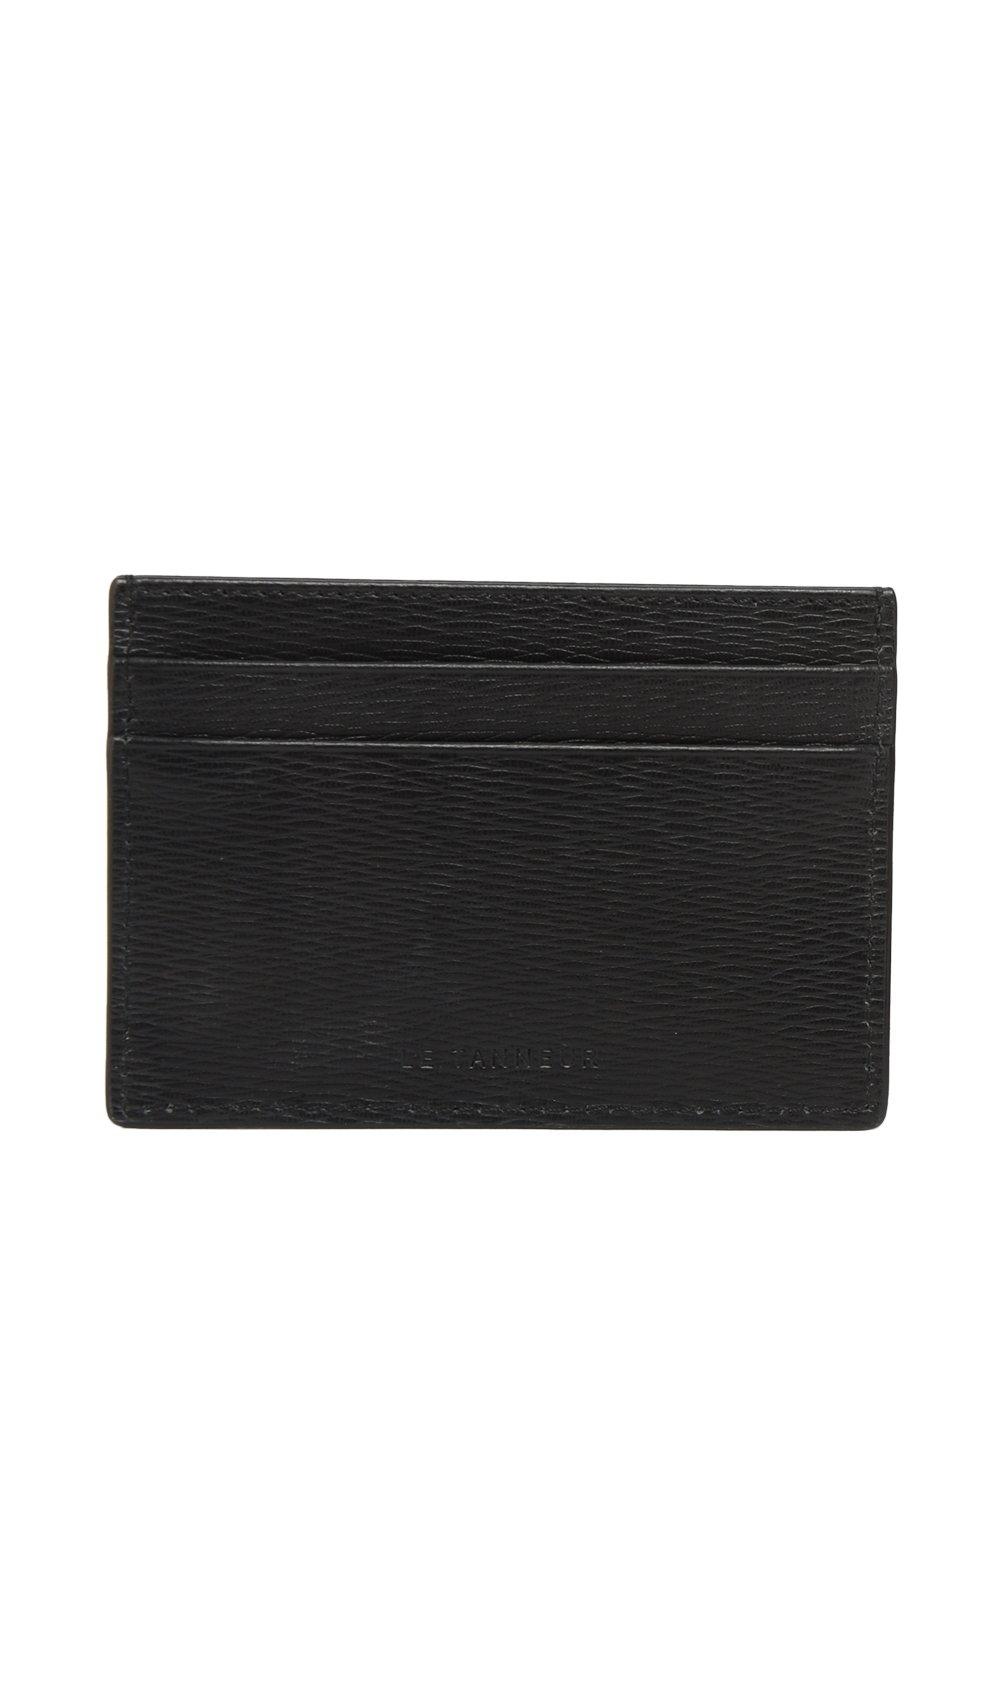 Le Tanneur Card holder TAY3406 N1 Black Men Spring/Summer Collection